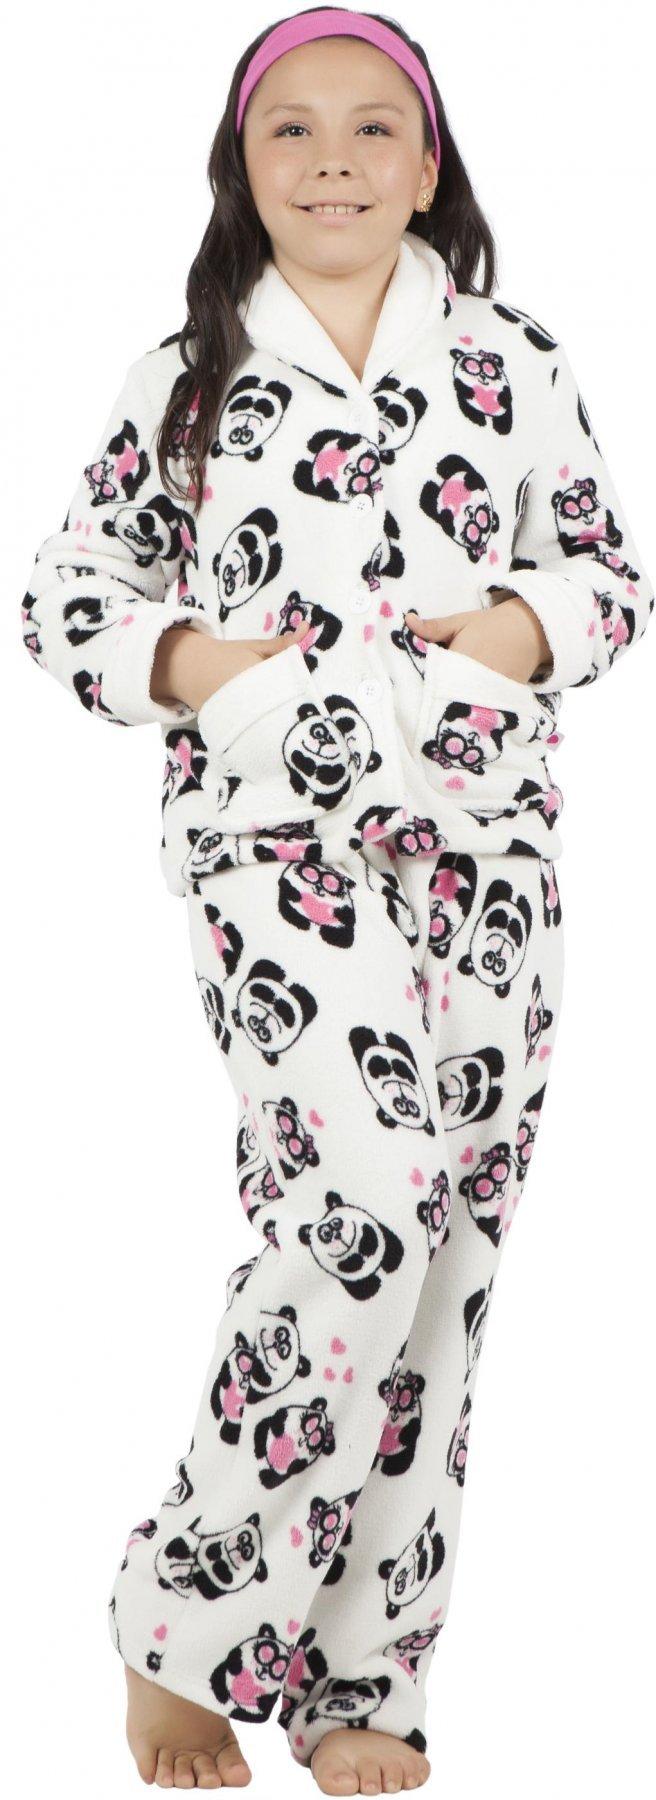 Pijama Soft Infantil Panda Promoção